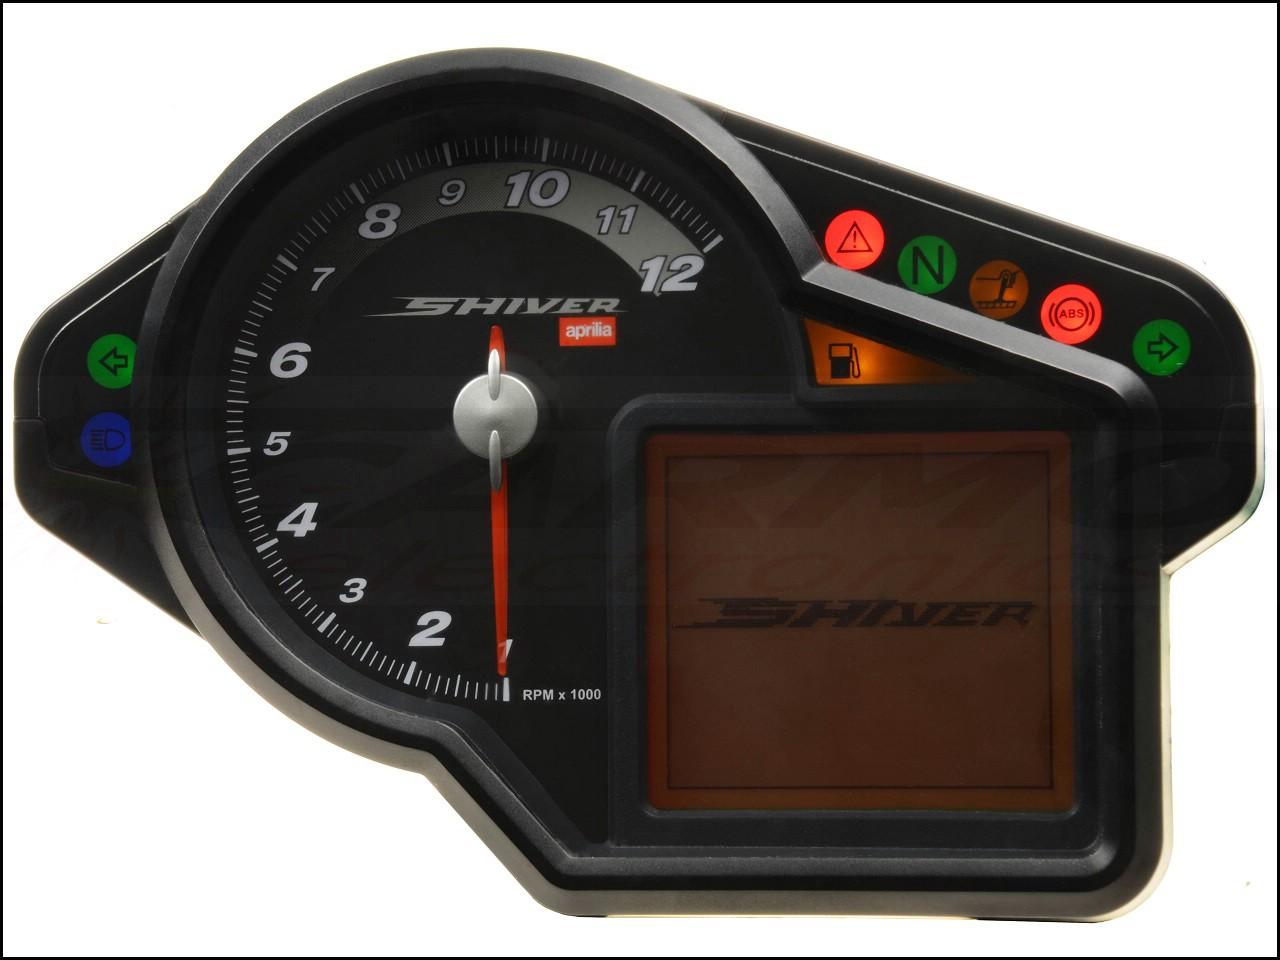 hight resolution of dashboard digidash digital speedometer tachometer lcd multifunction meter shiver oem number 860739 commen problem display doesn t work